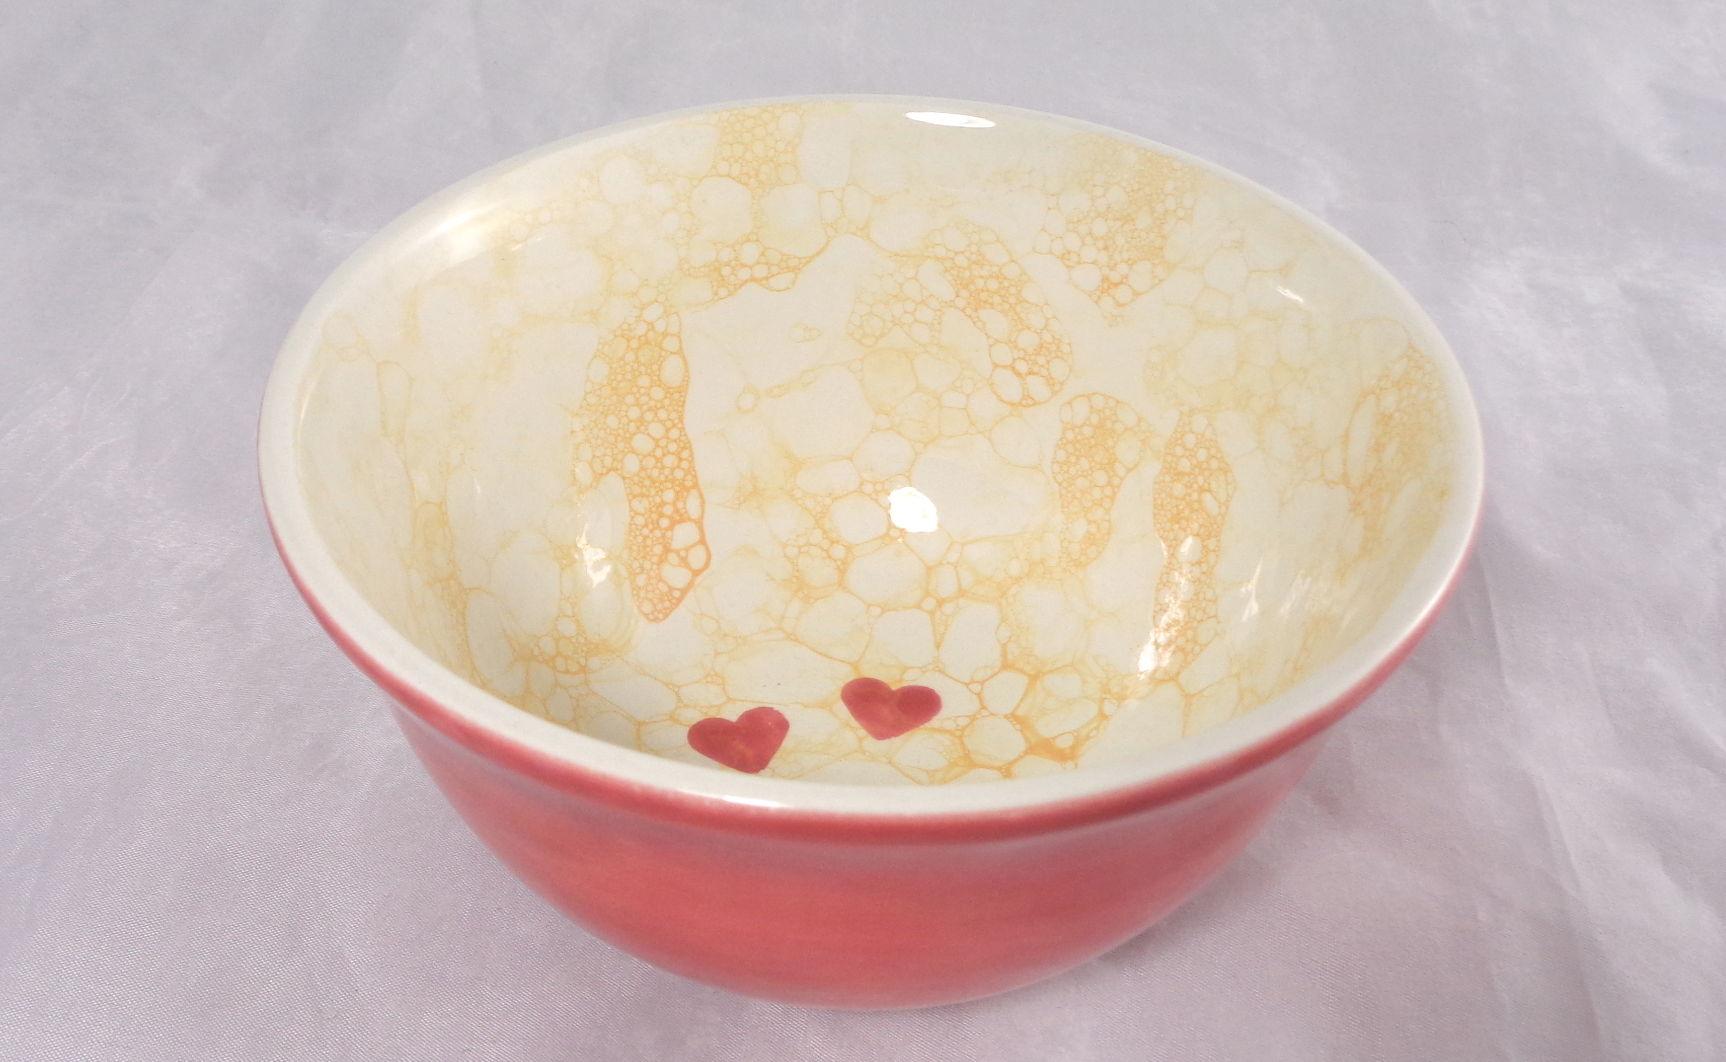 Bemalte Keramik Blubber-Vintage rot-orange